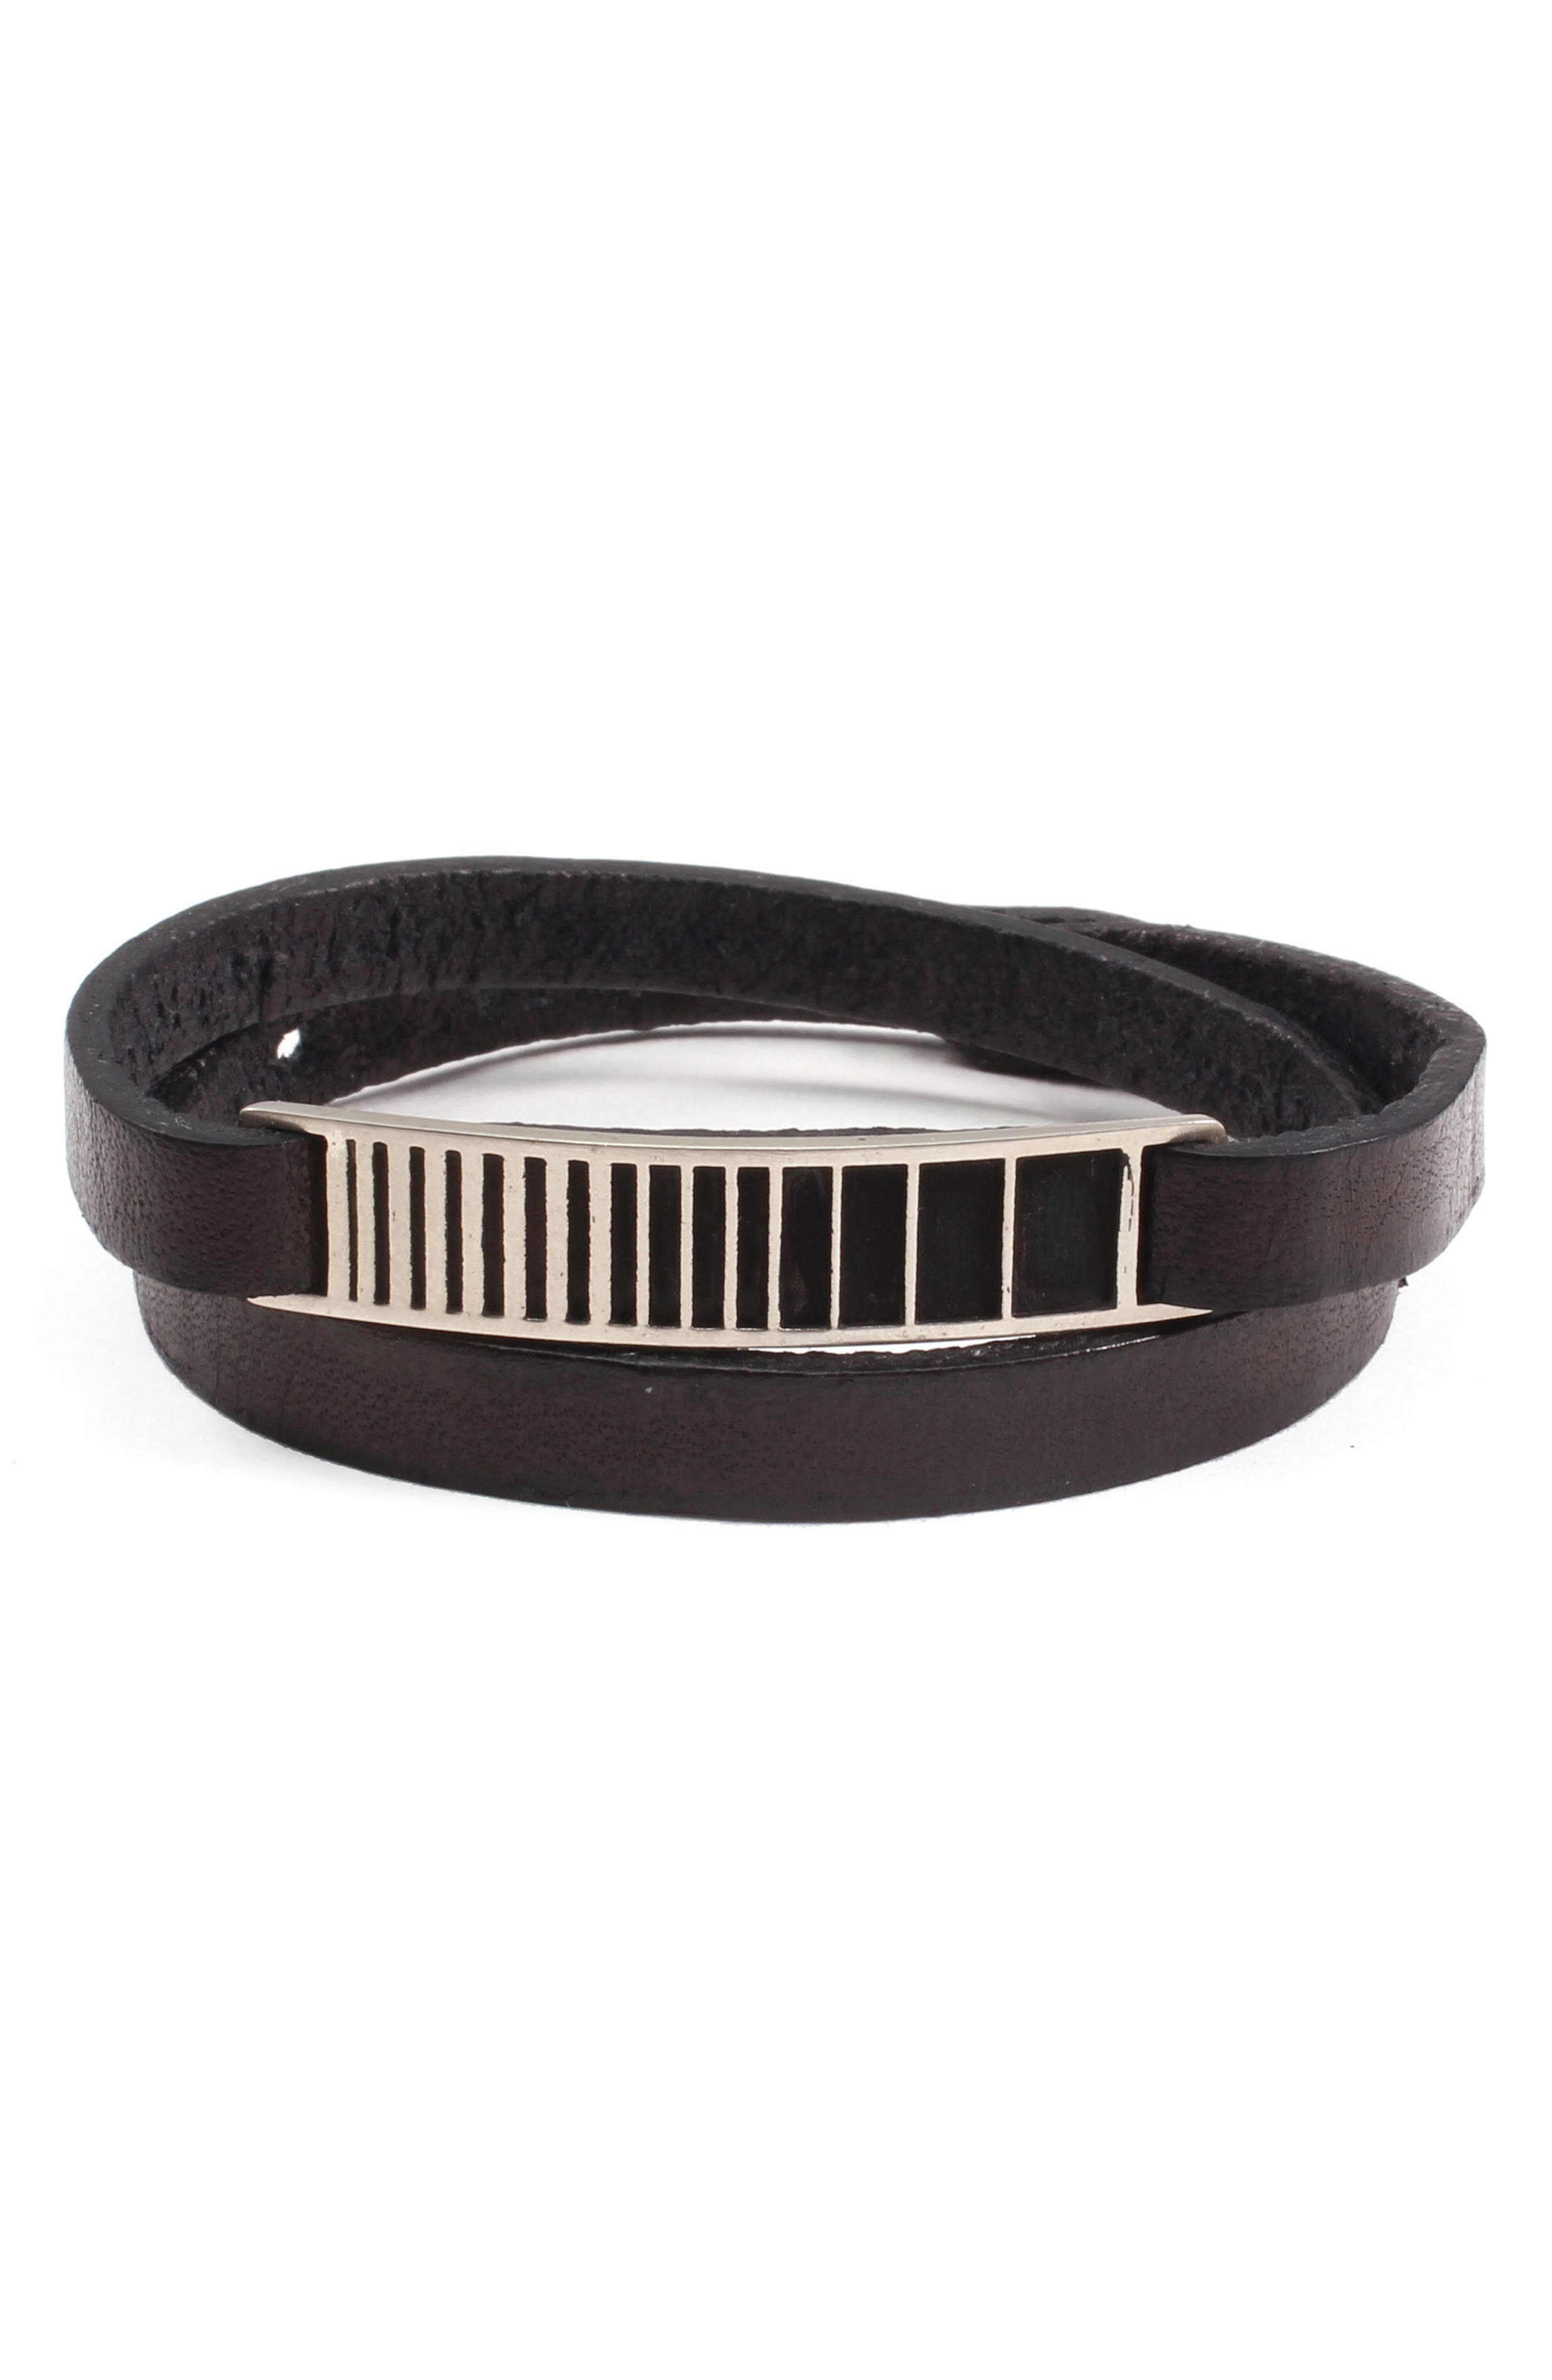 Utopia ID Leather Wrap Bracelet,                             Main thumbnail 1, color,